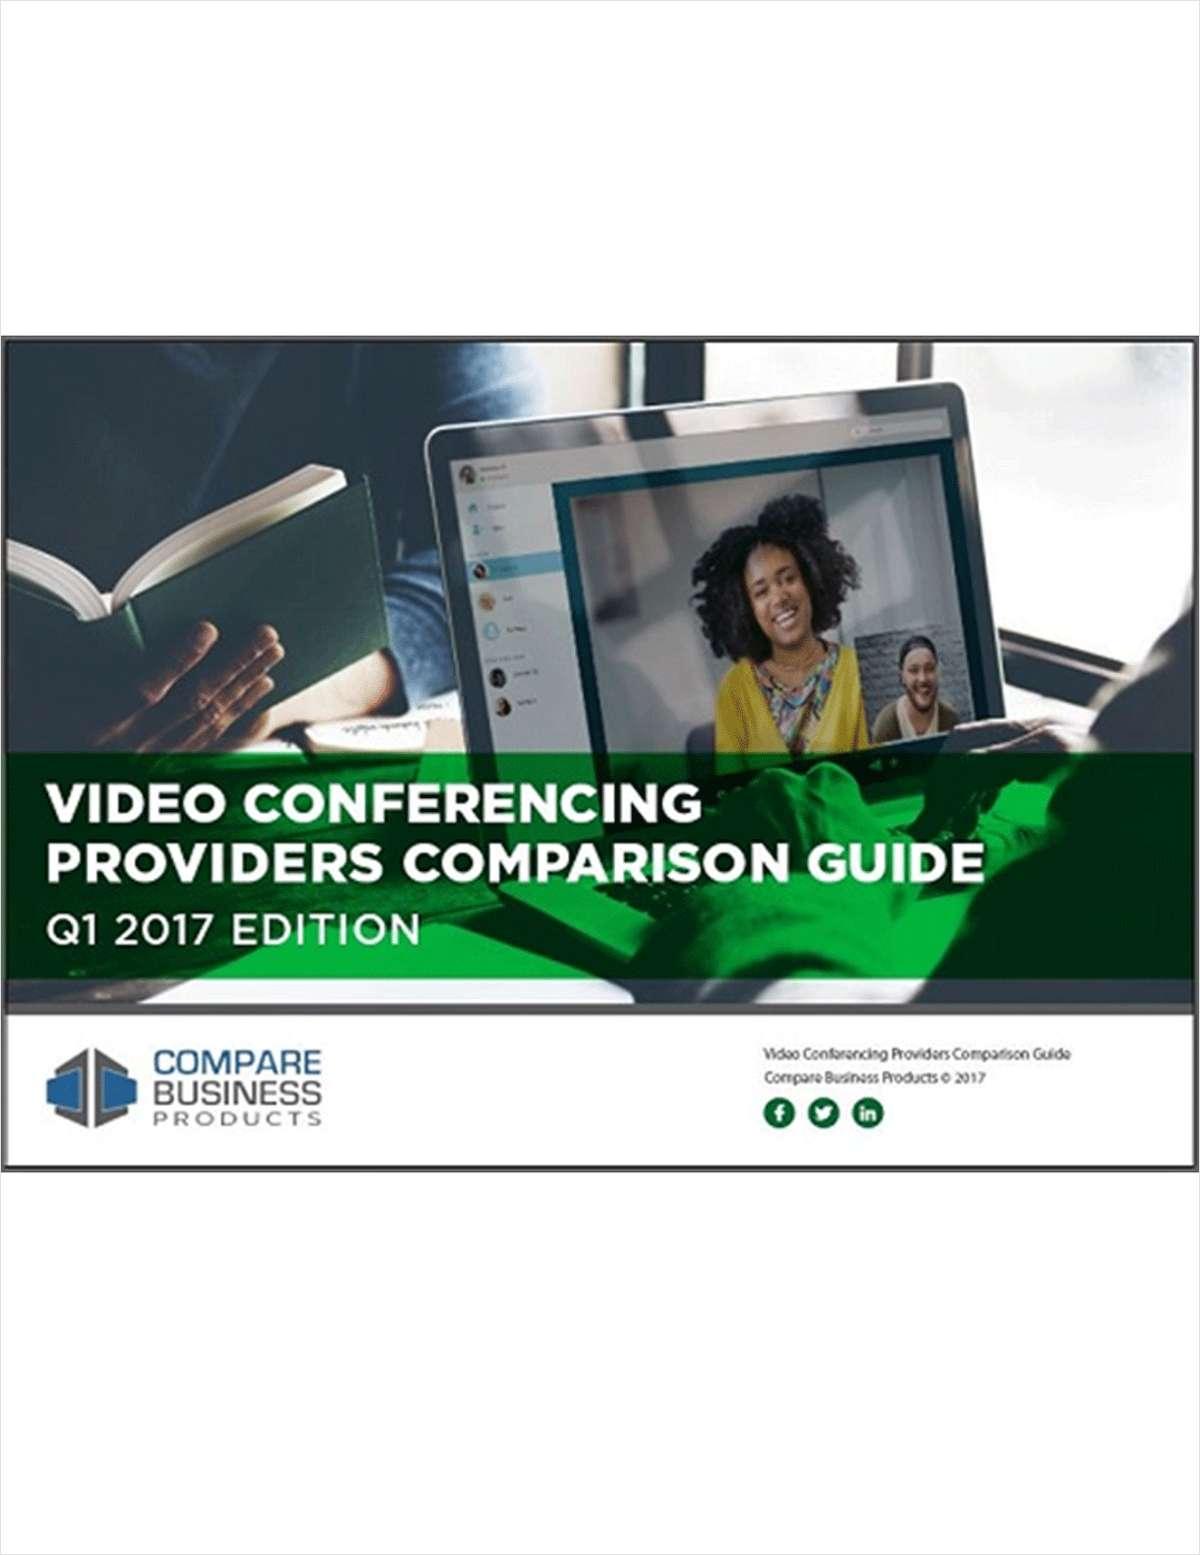 The New 2017 Video Conferencing Comparison Guide